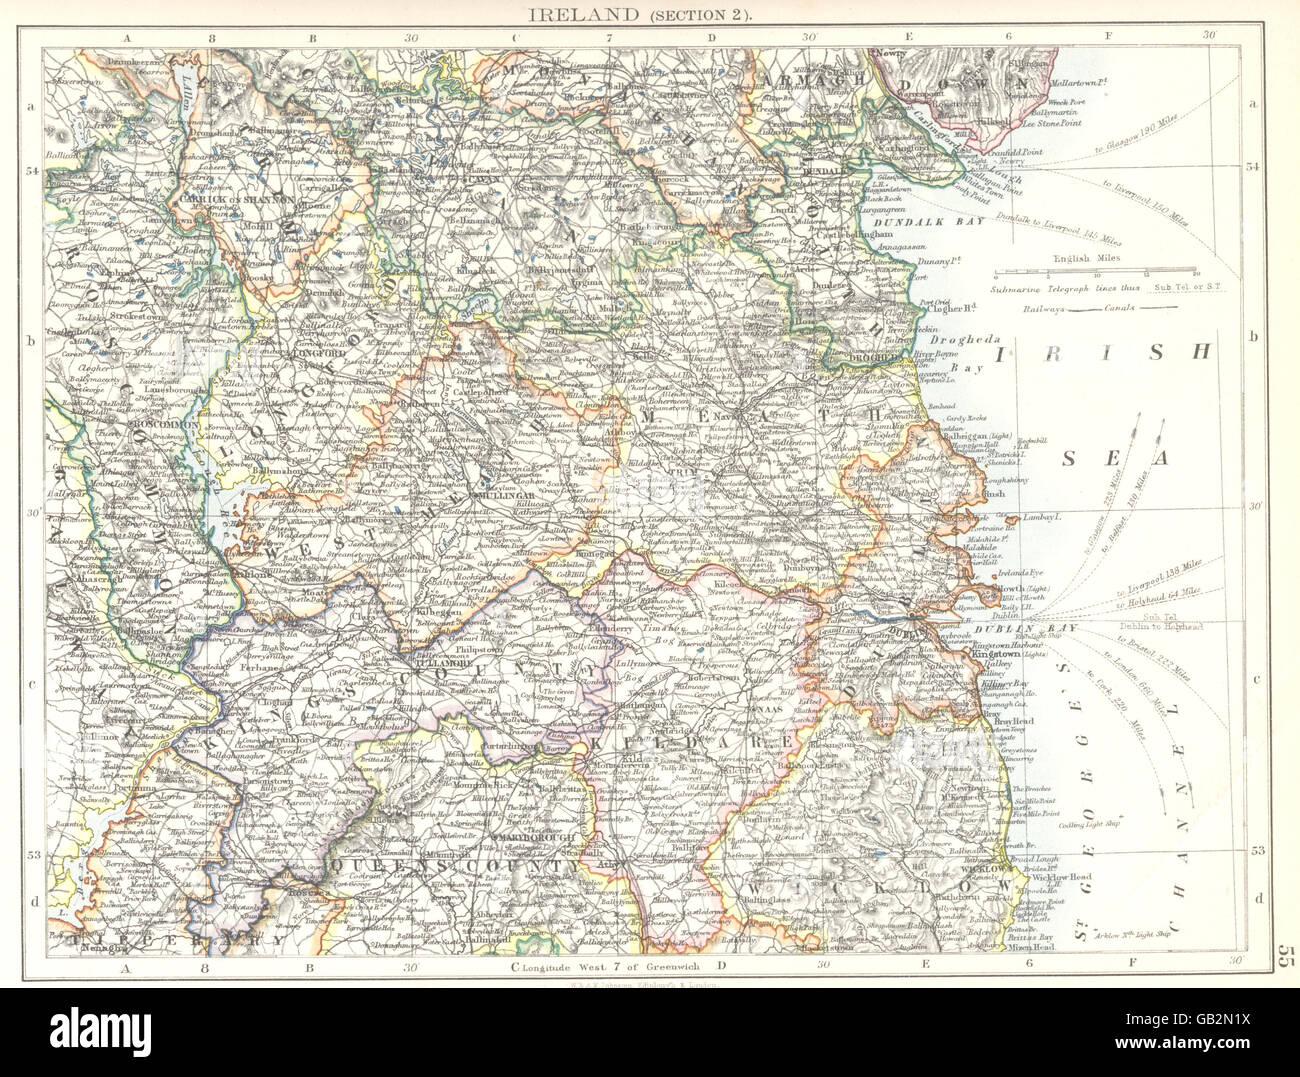 Map Of Dublin 7 Ireland.Ireland Kildare Wicklow Meath Dublin Longford Louth Offaly Laios